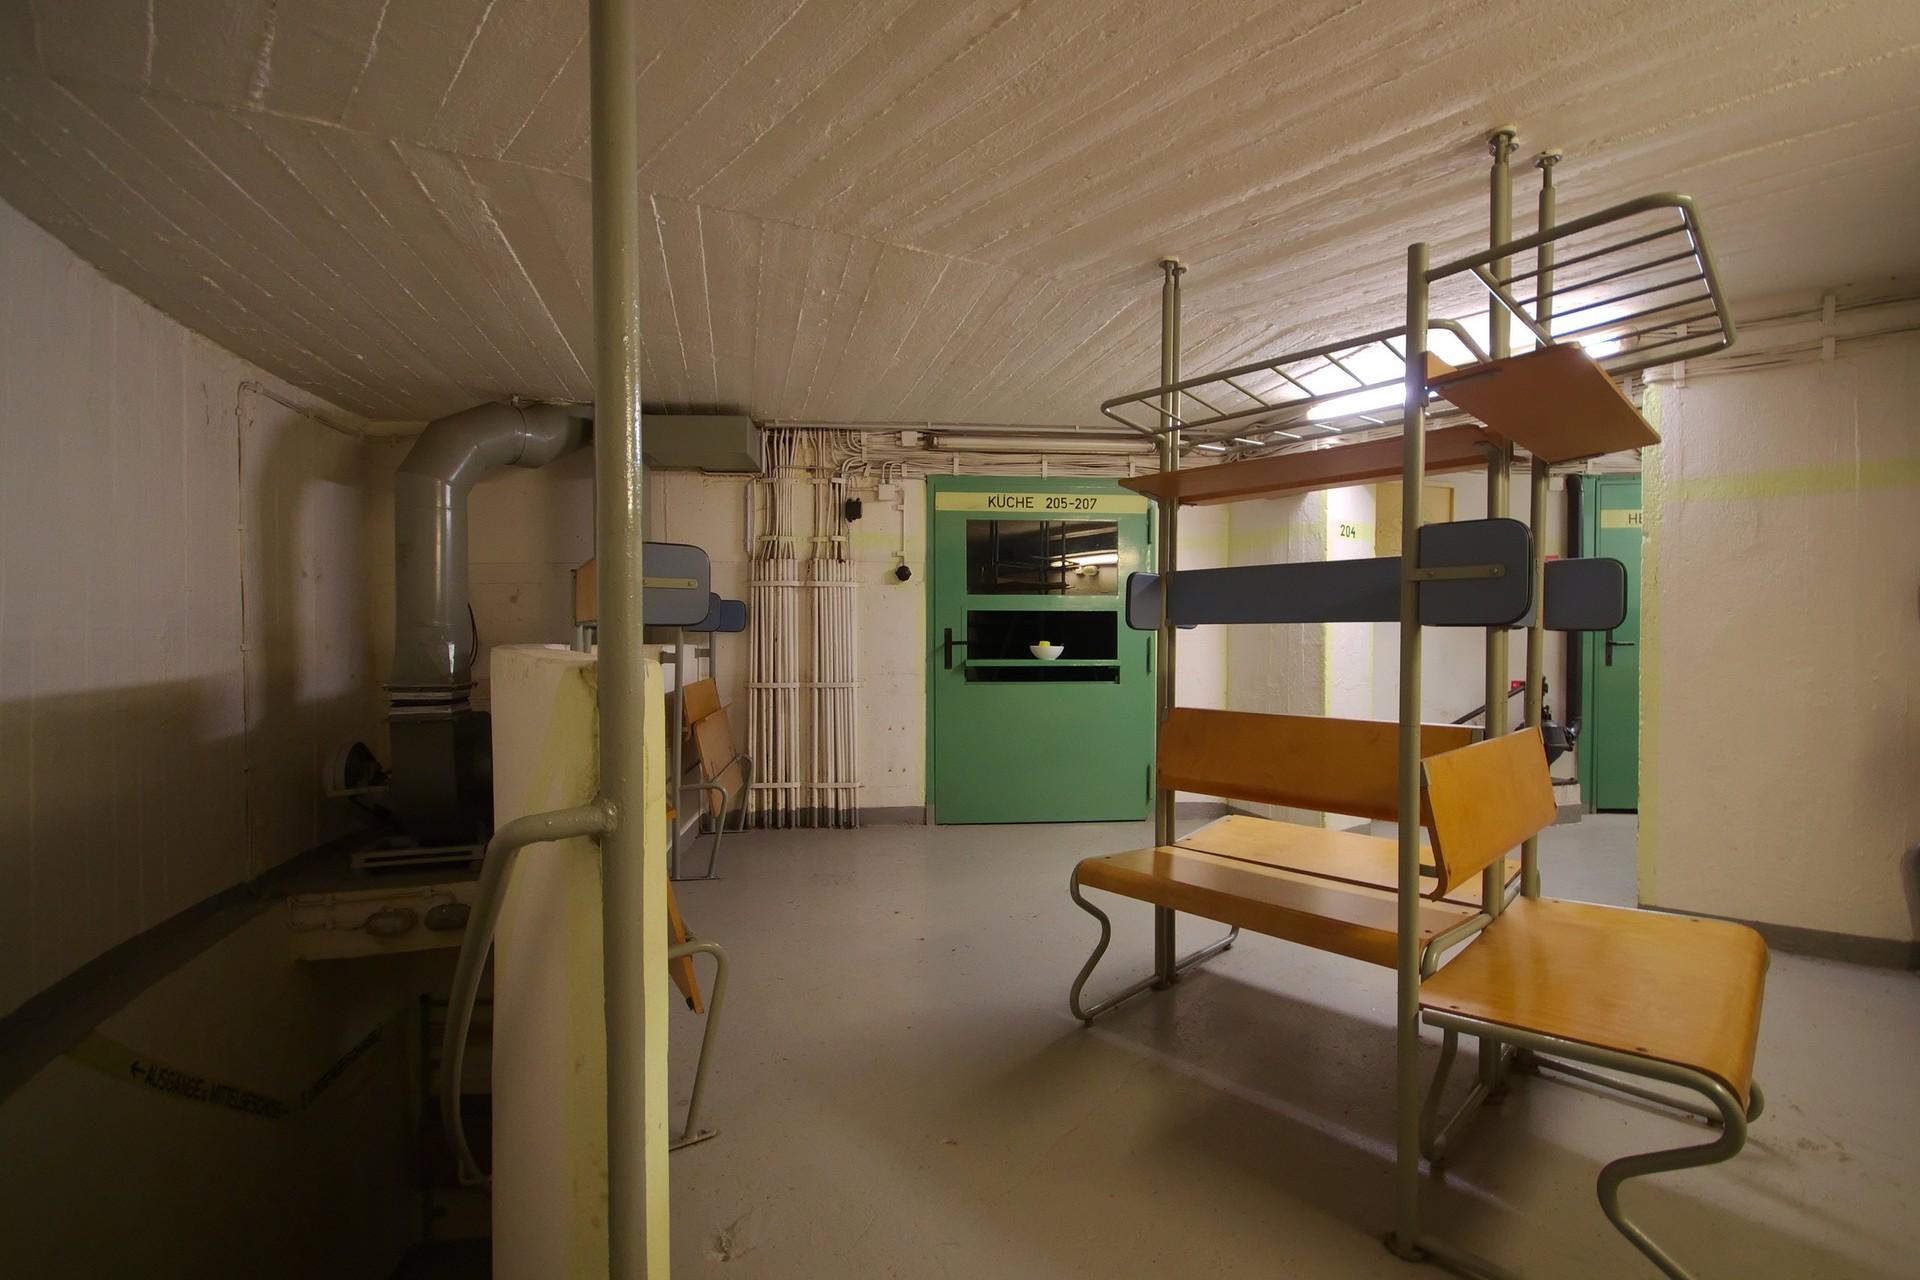 k che und speisesaal secret hamburg fotos aus hamburg. Black Bedroom Furniture Sets. Home Design Ideas